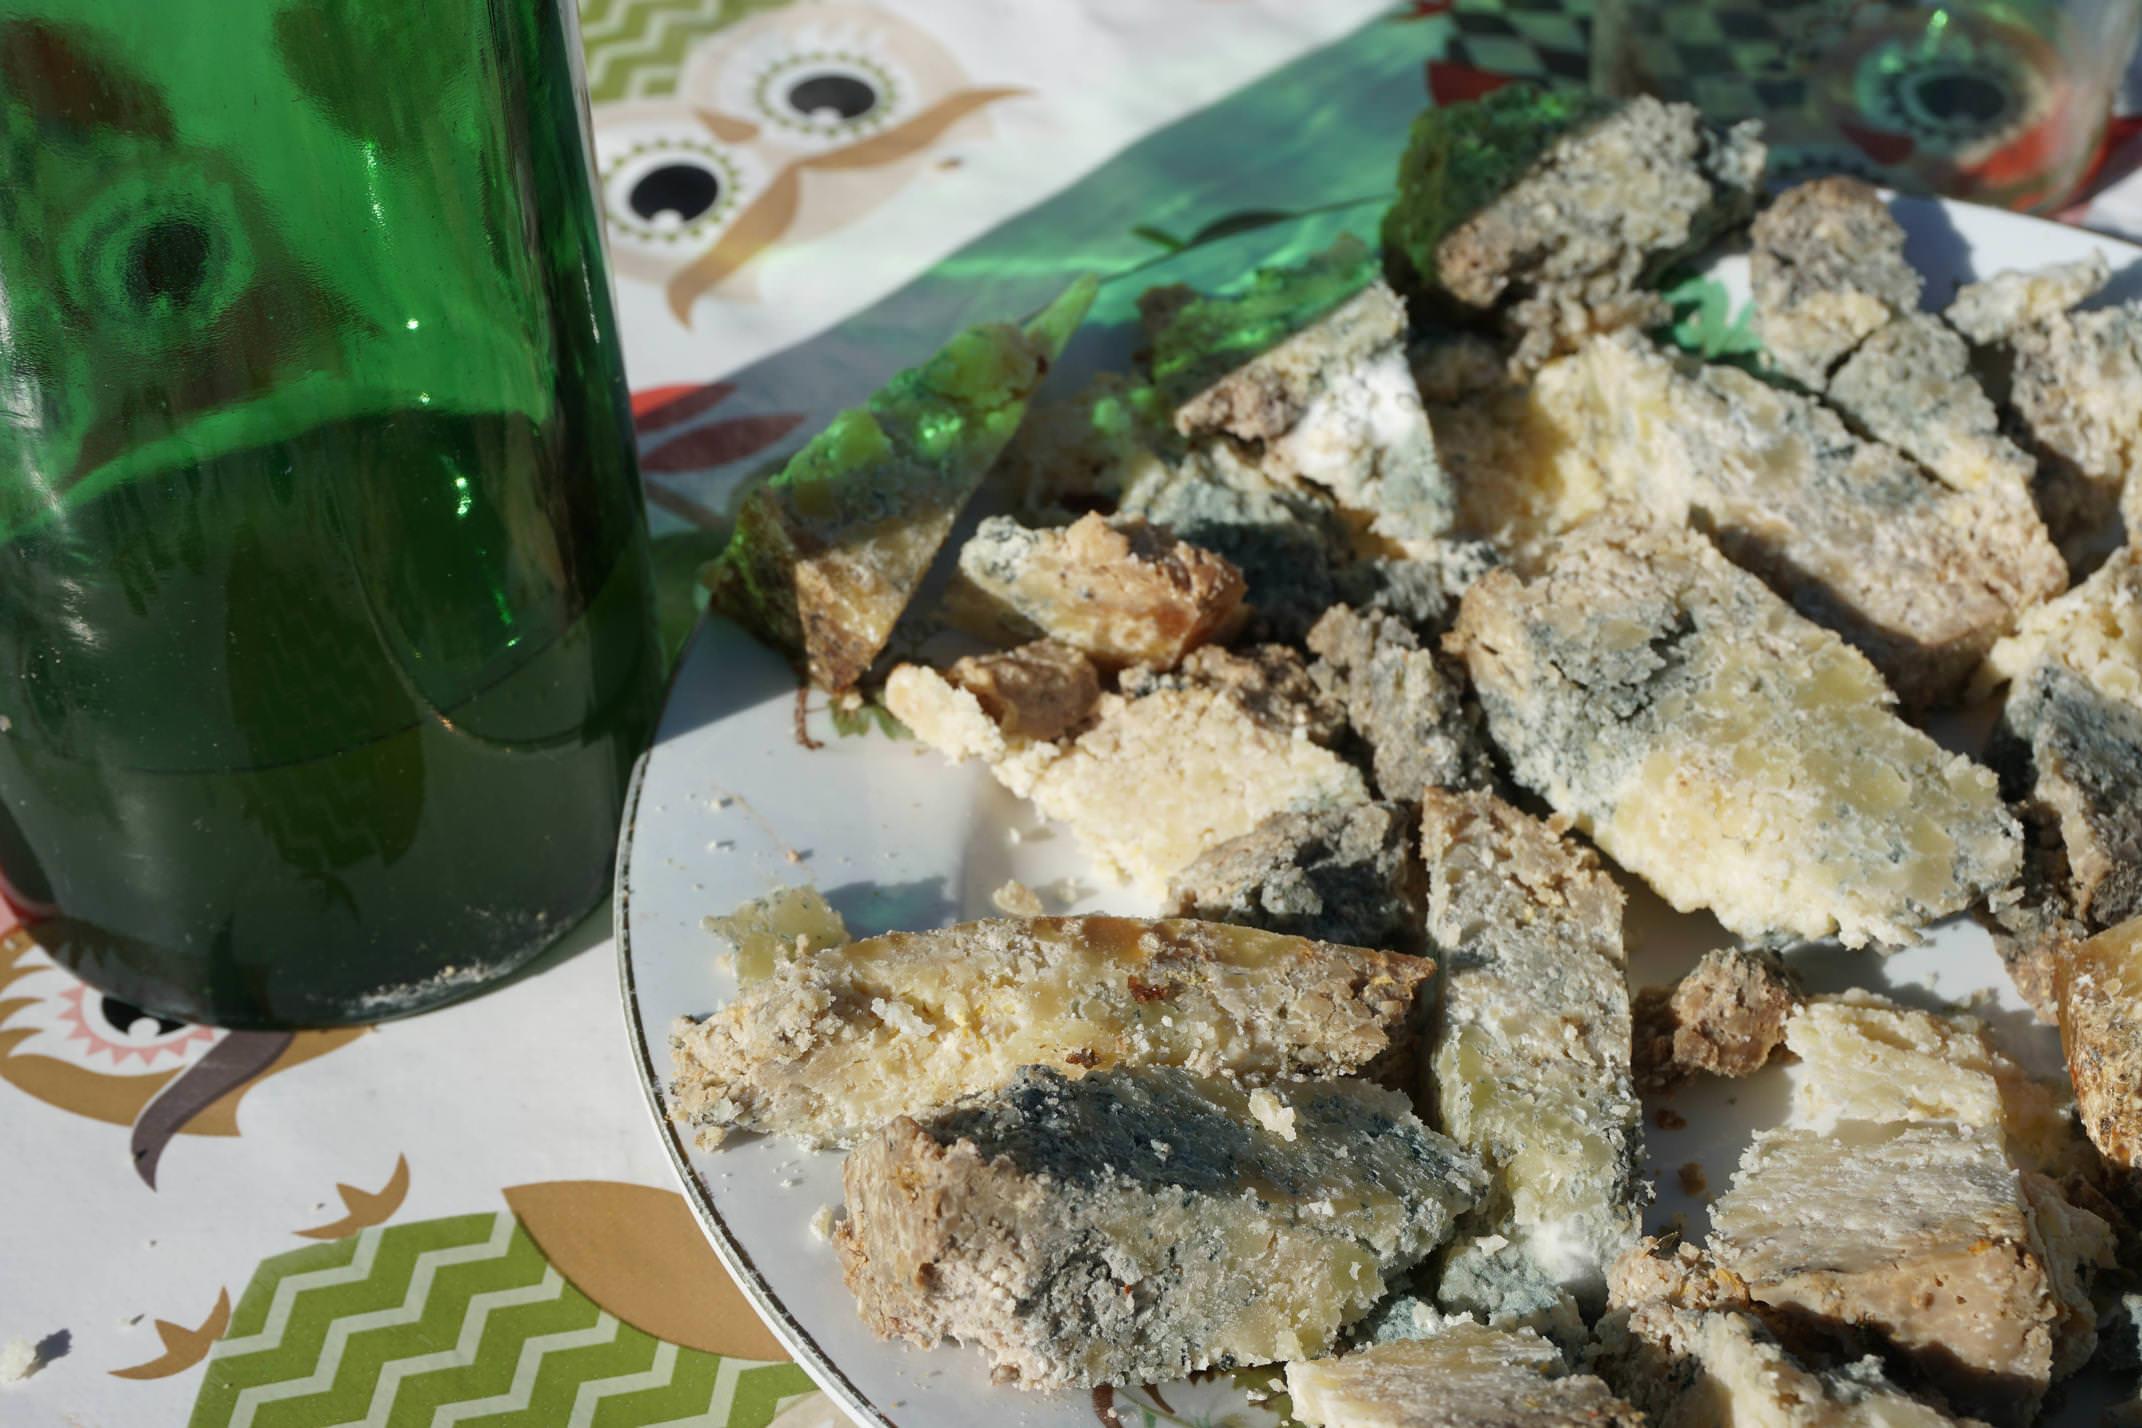 Spain picos de europa cider humartini gamoneu cheese